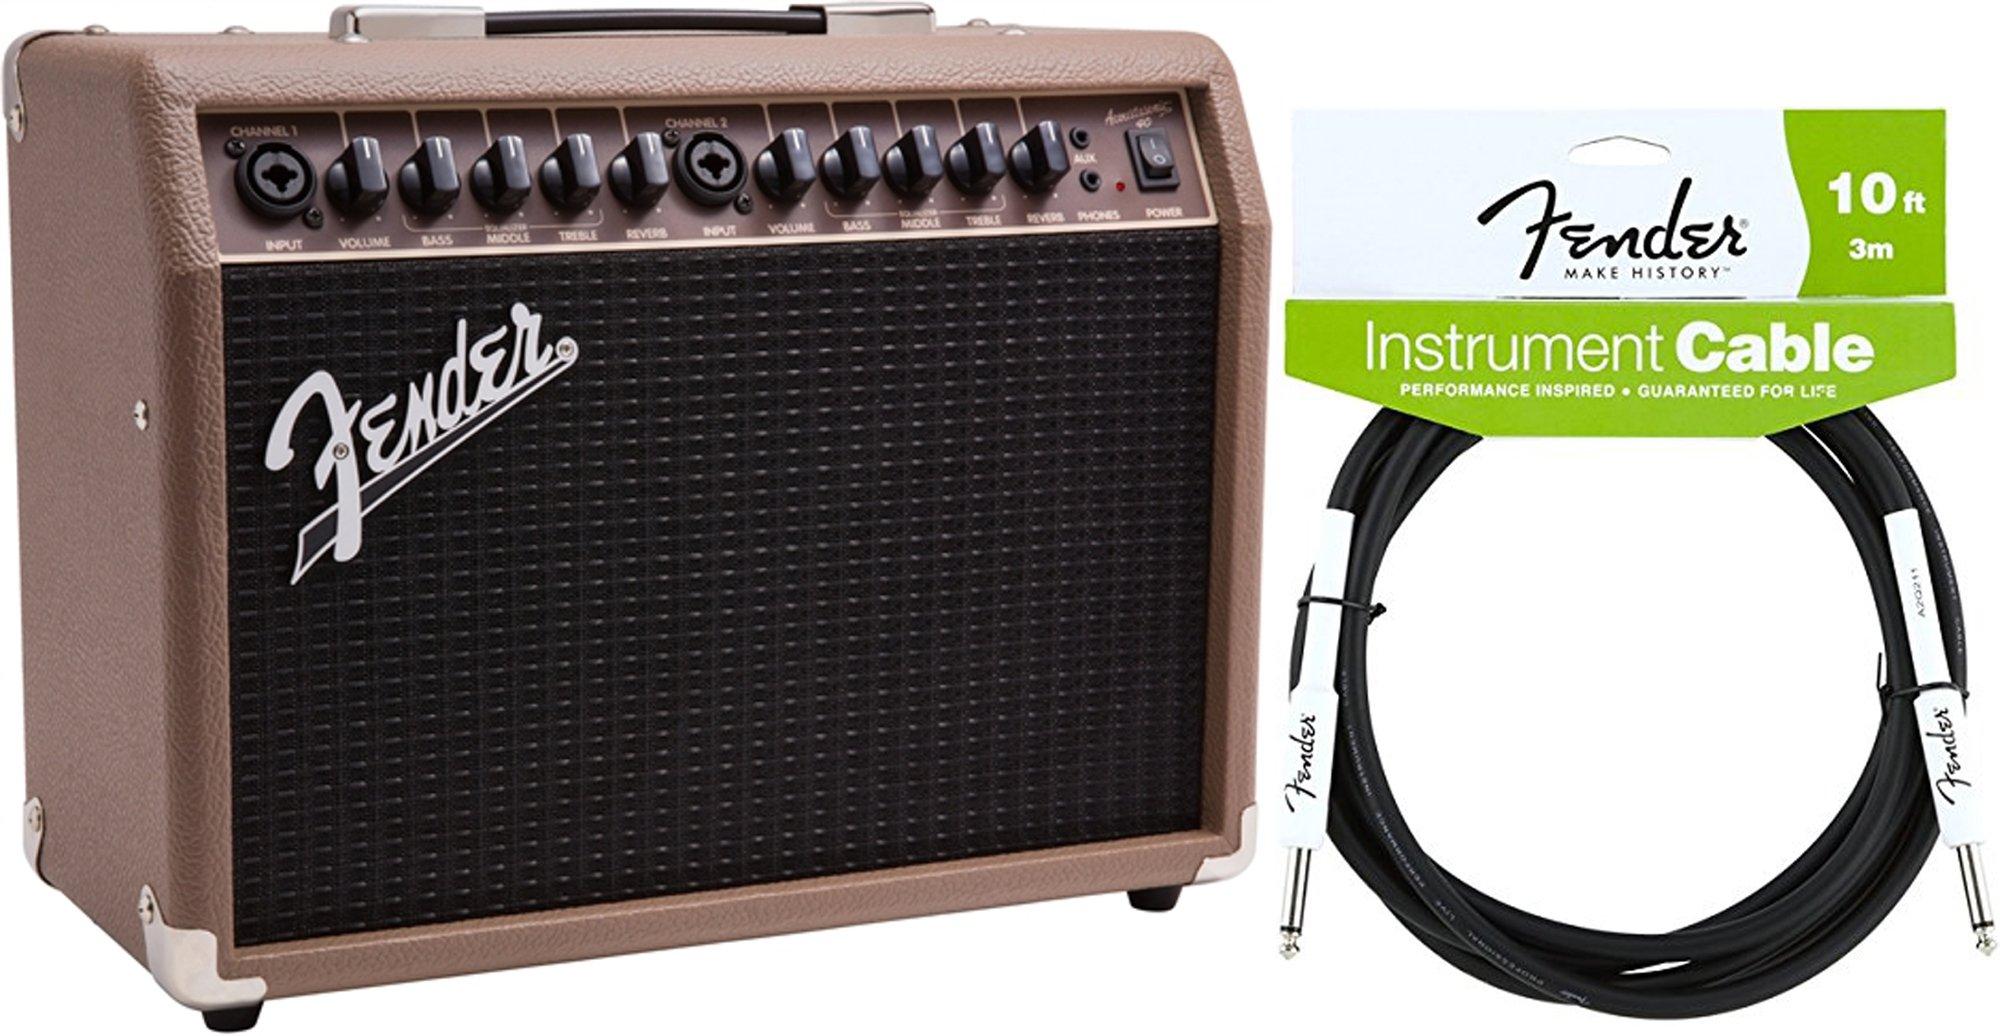 Fender Acoustasonic 40- 40w Acoustic Guitar Amp 120V w/ Instrument Cable